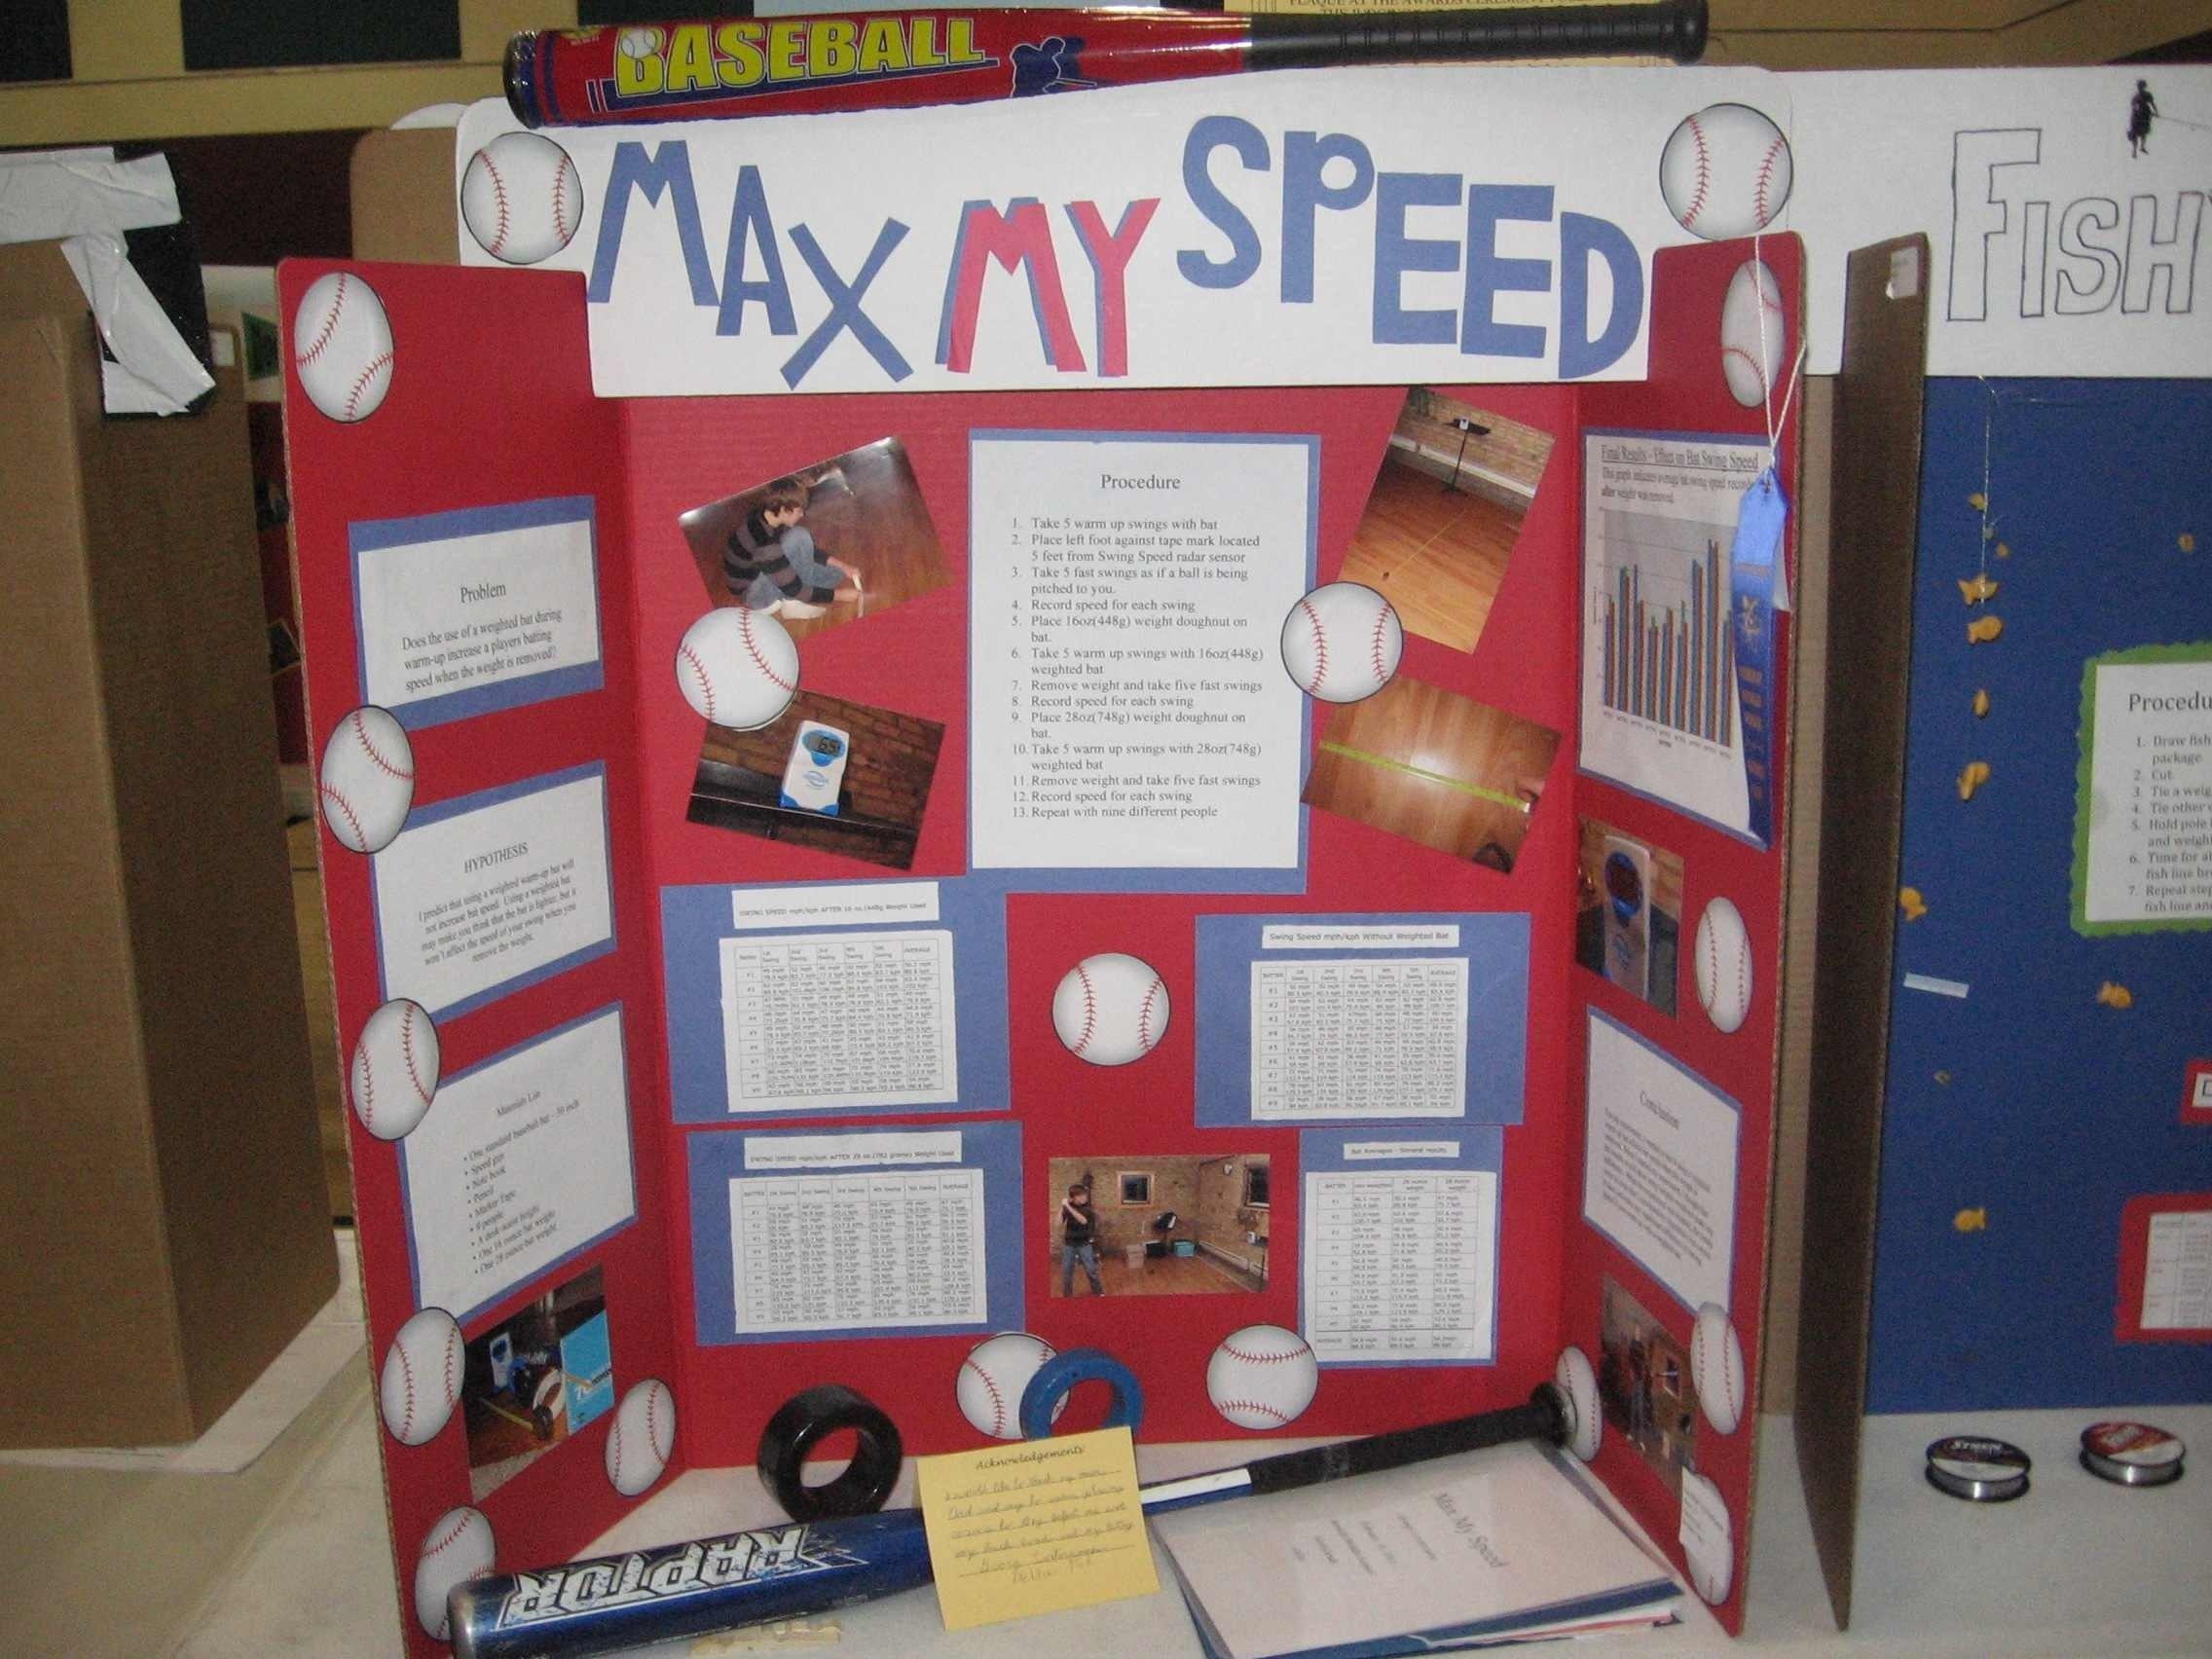 10 Pretty Good Ideas For Science Projects ms bergs delta science bemidji k12 mn 29 2020